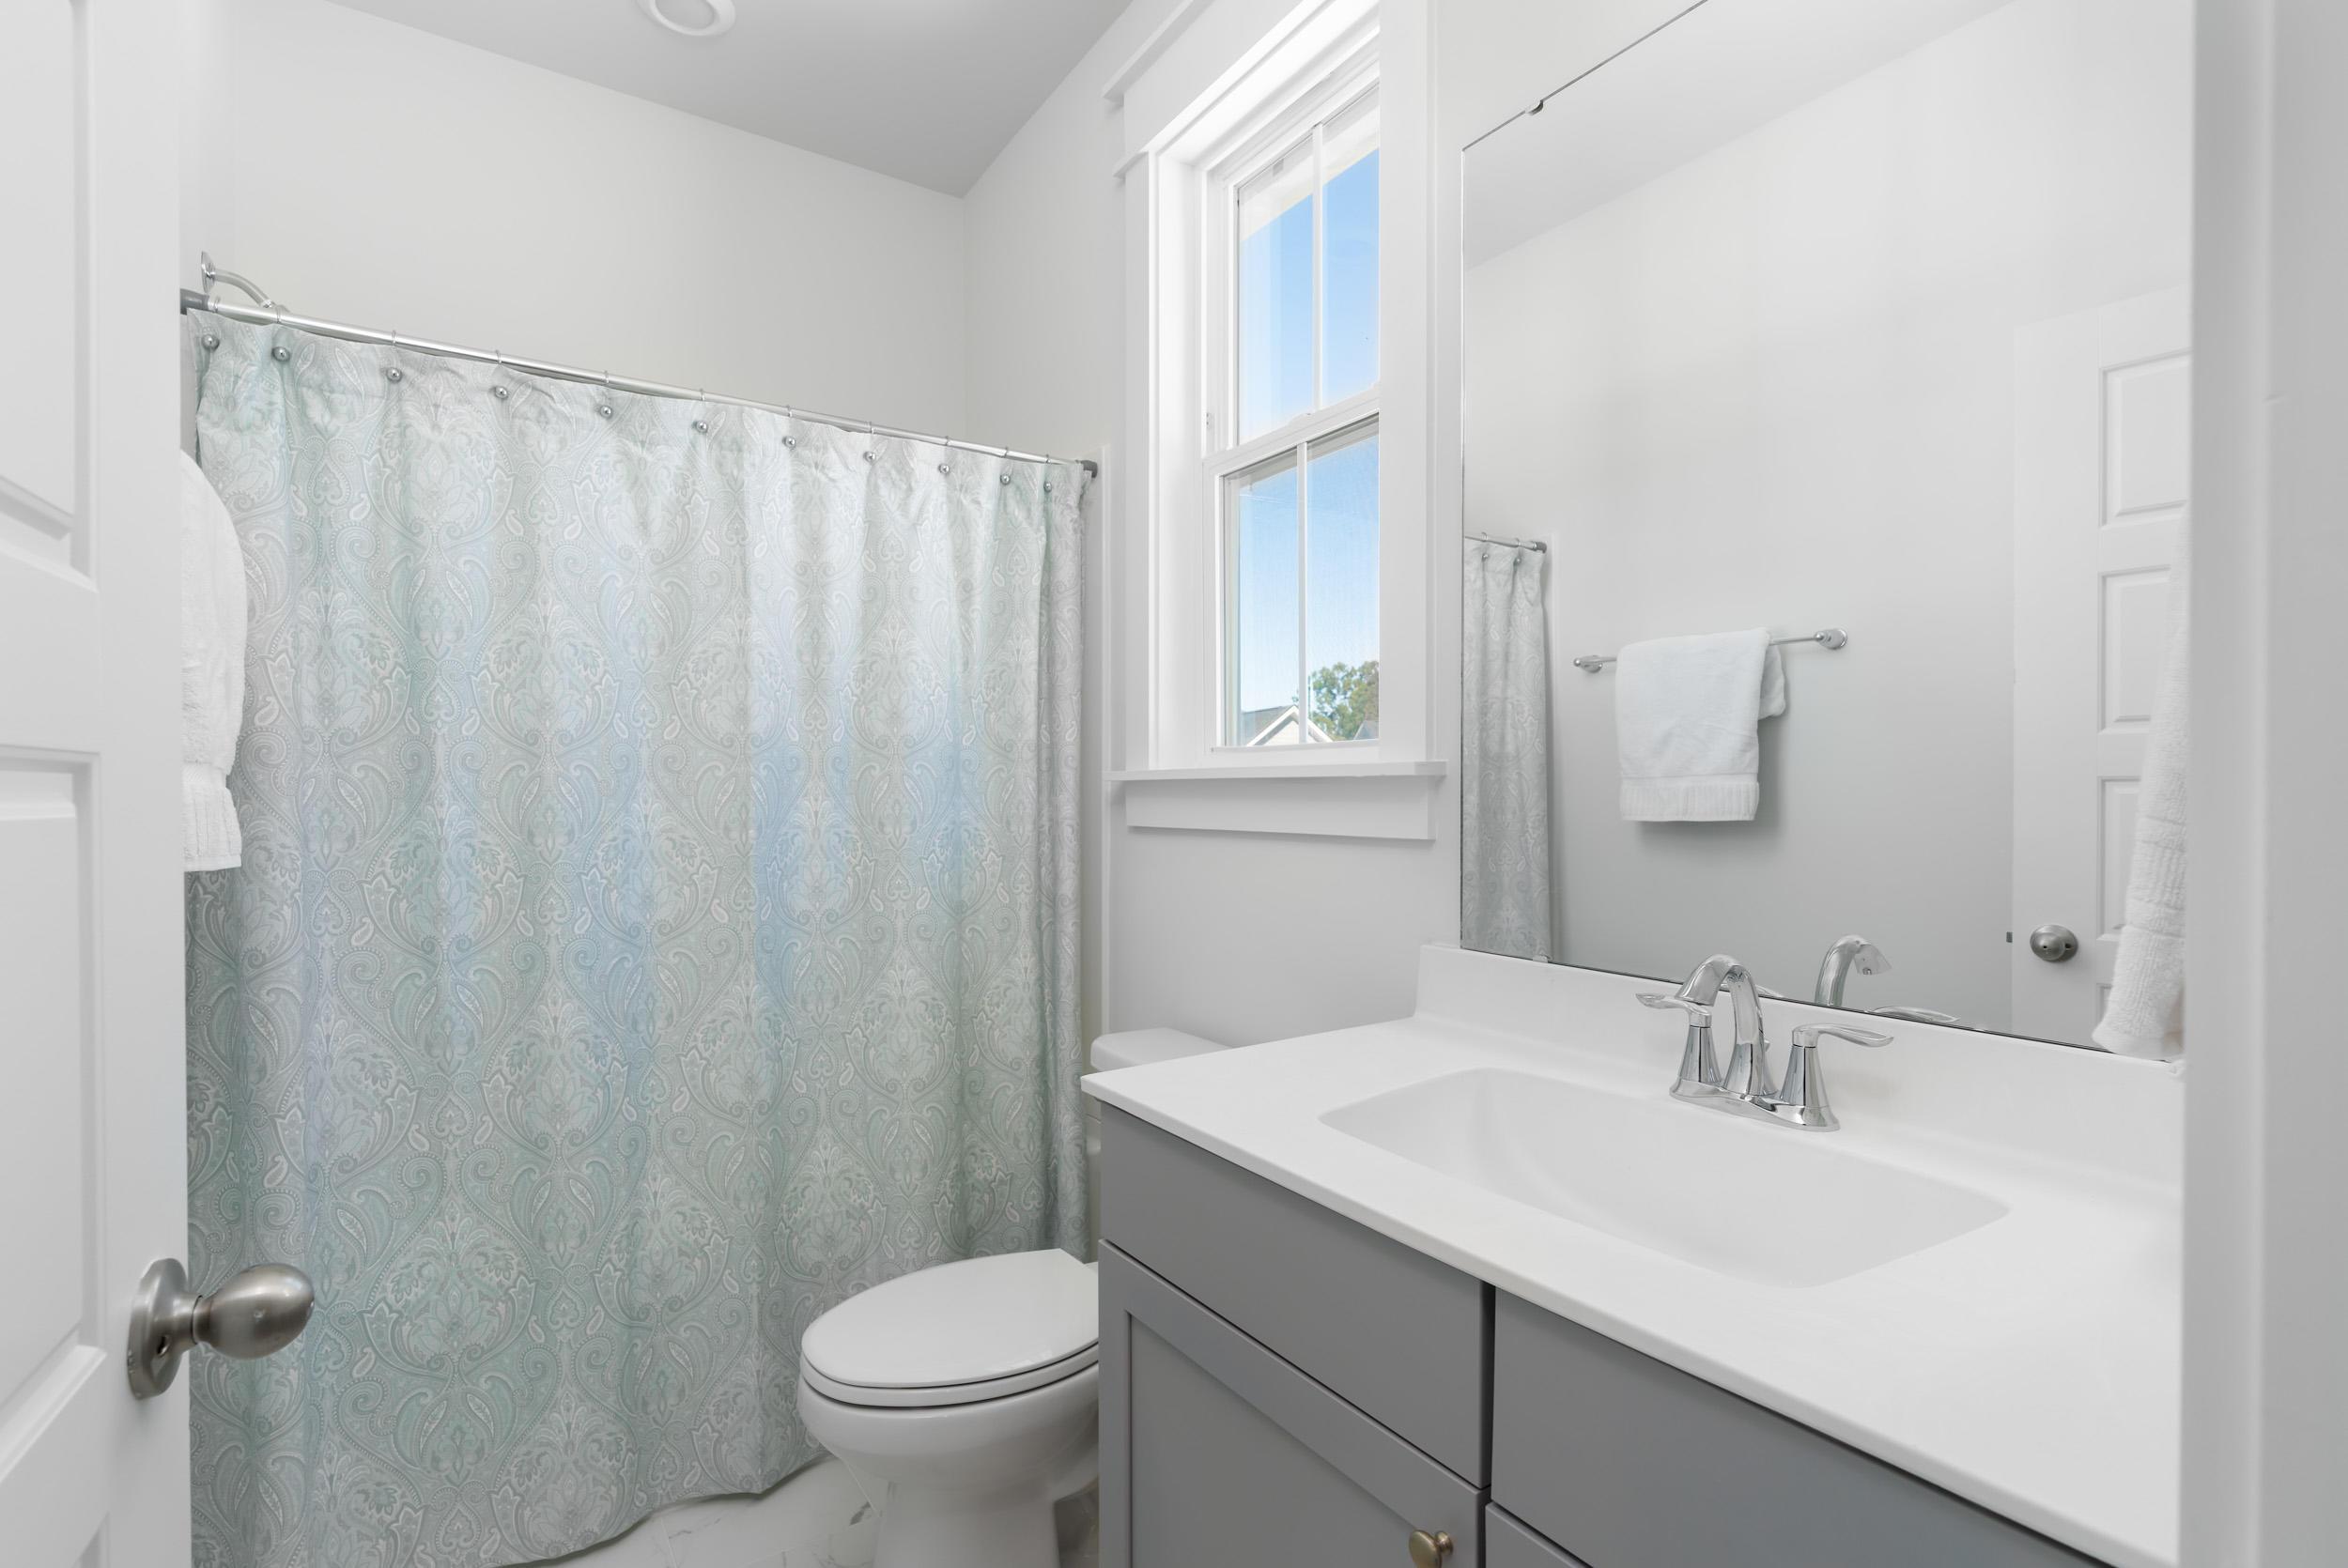 Hamlin Oaks Homes For Sale - 2921 Tranquility, Mount Pleasant, SC - 23